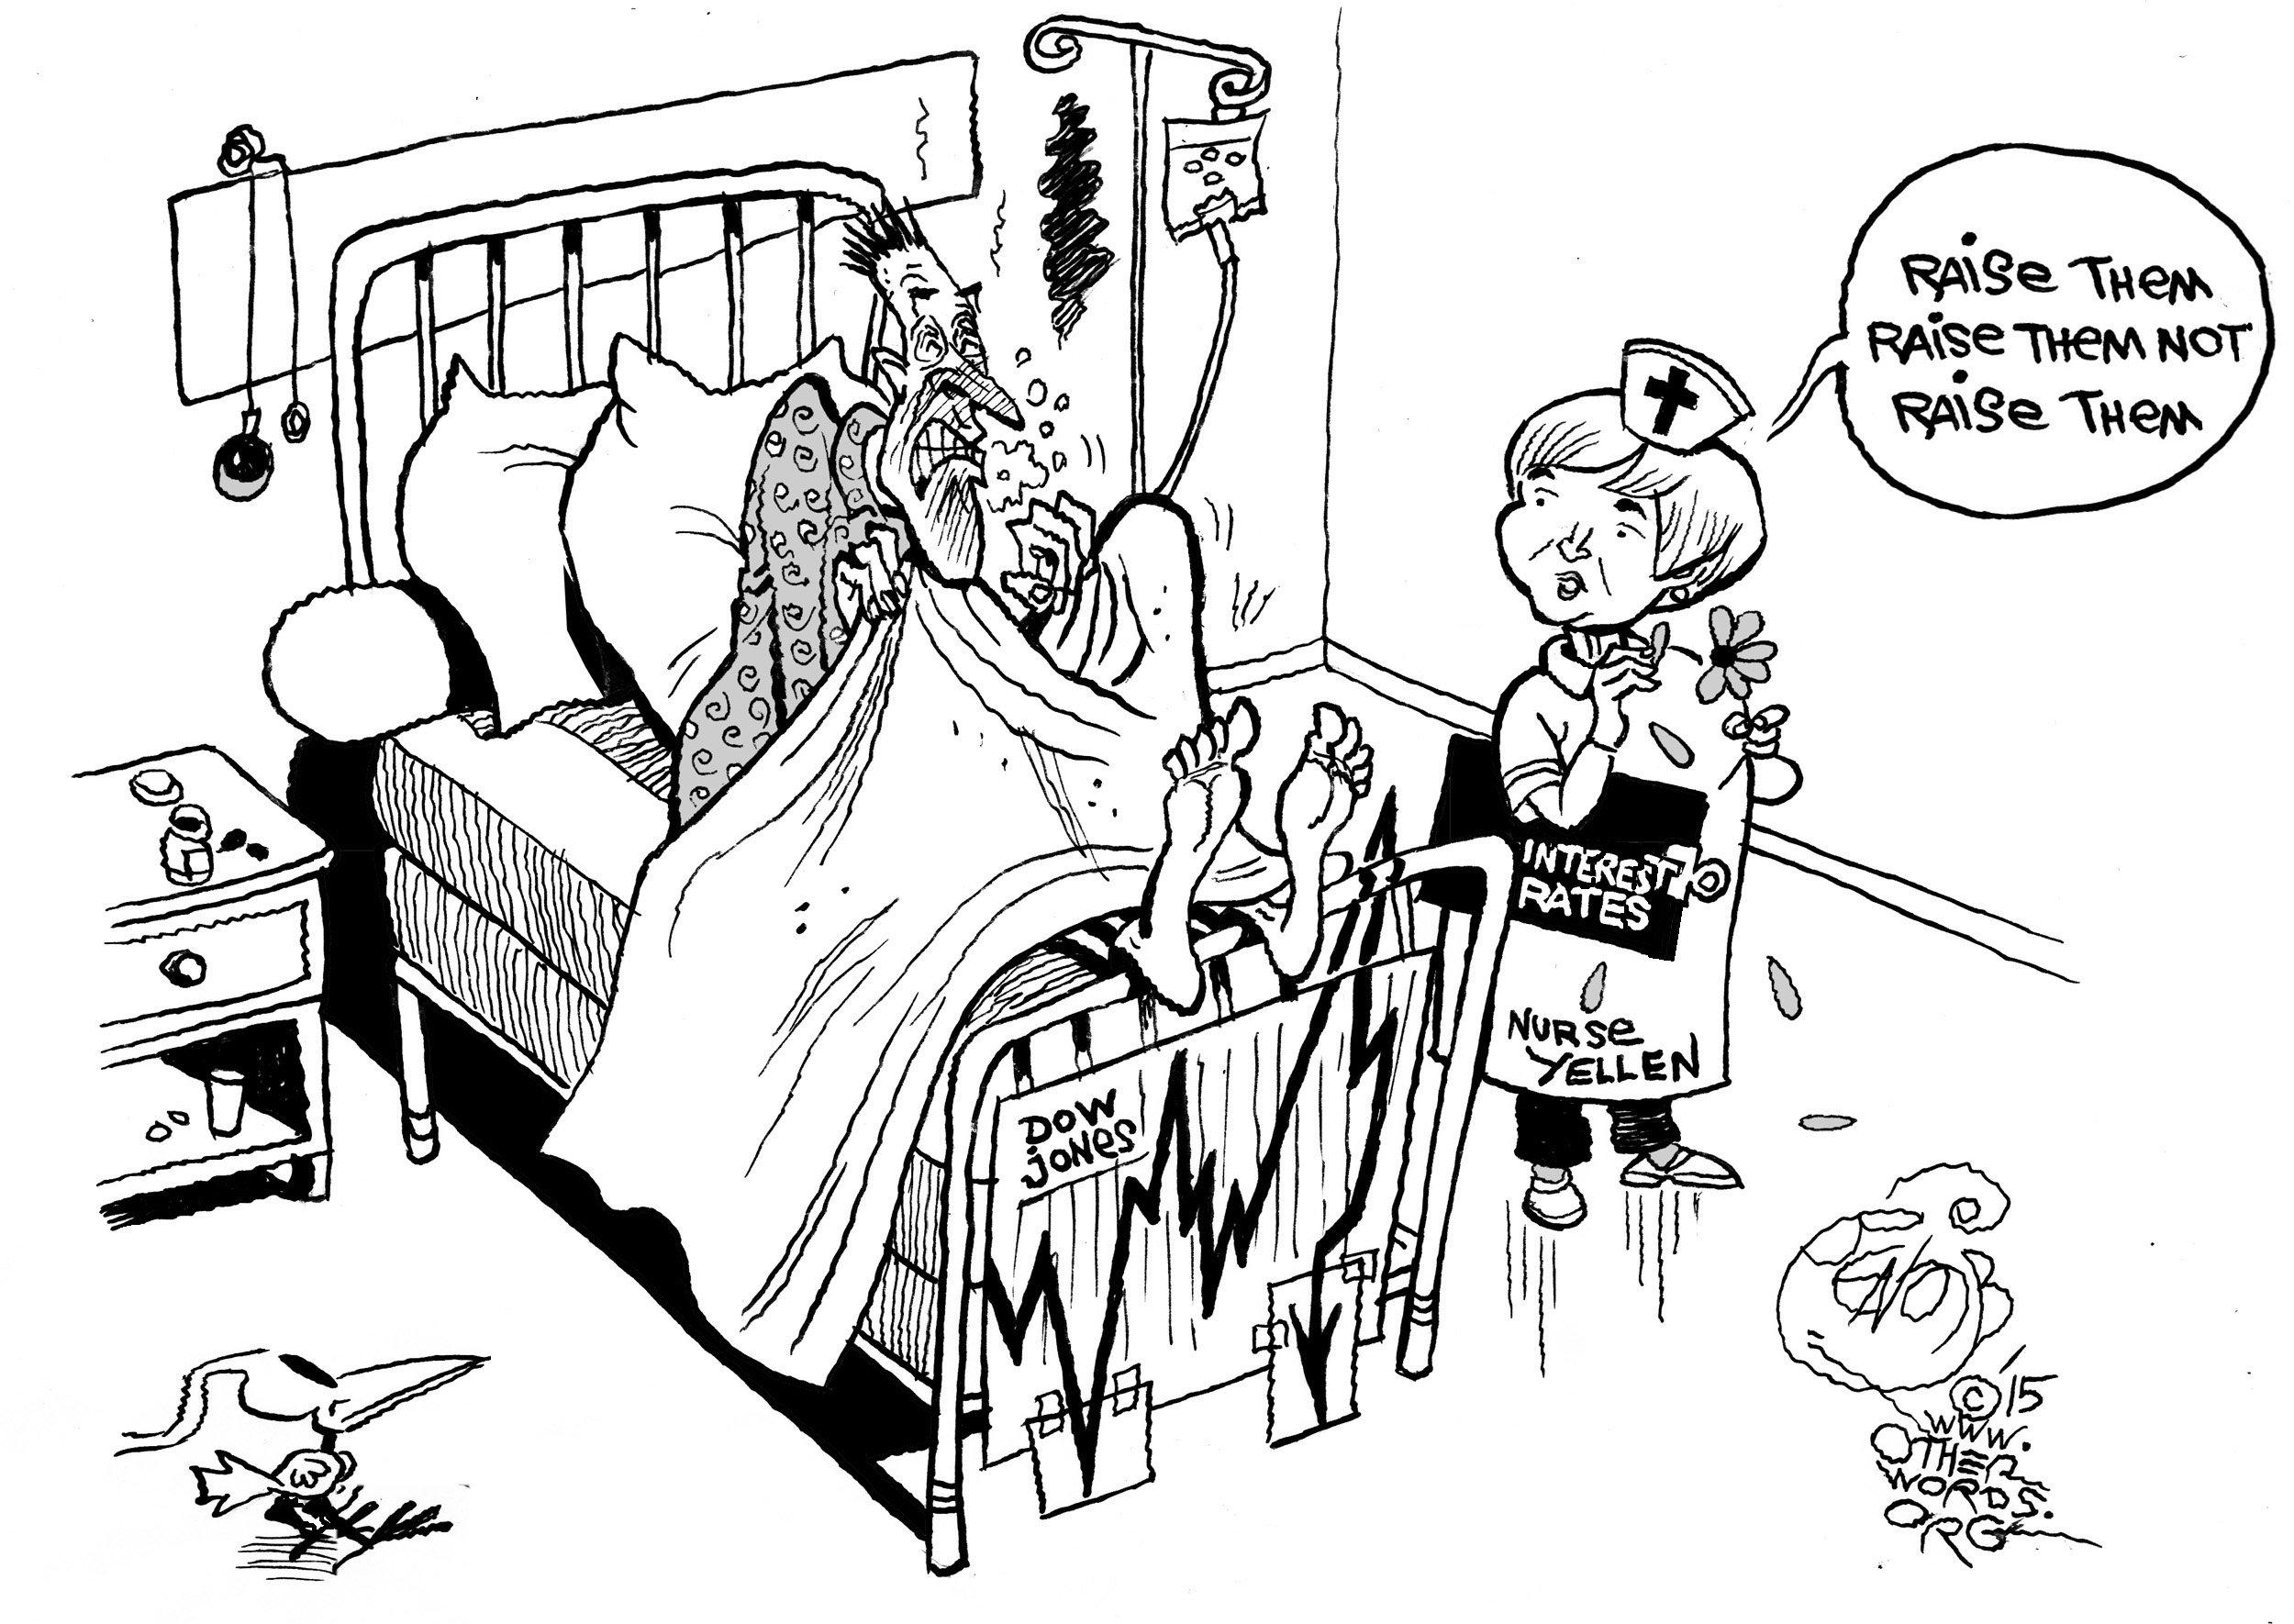 The Stock Market Breaks into Cold Sweats, an OtherWords cartoon by Khalil Bendib